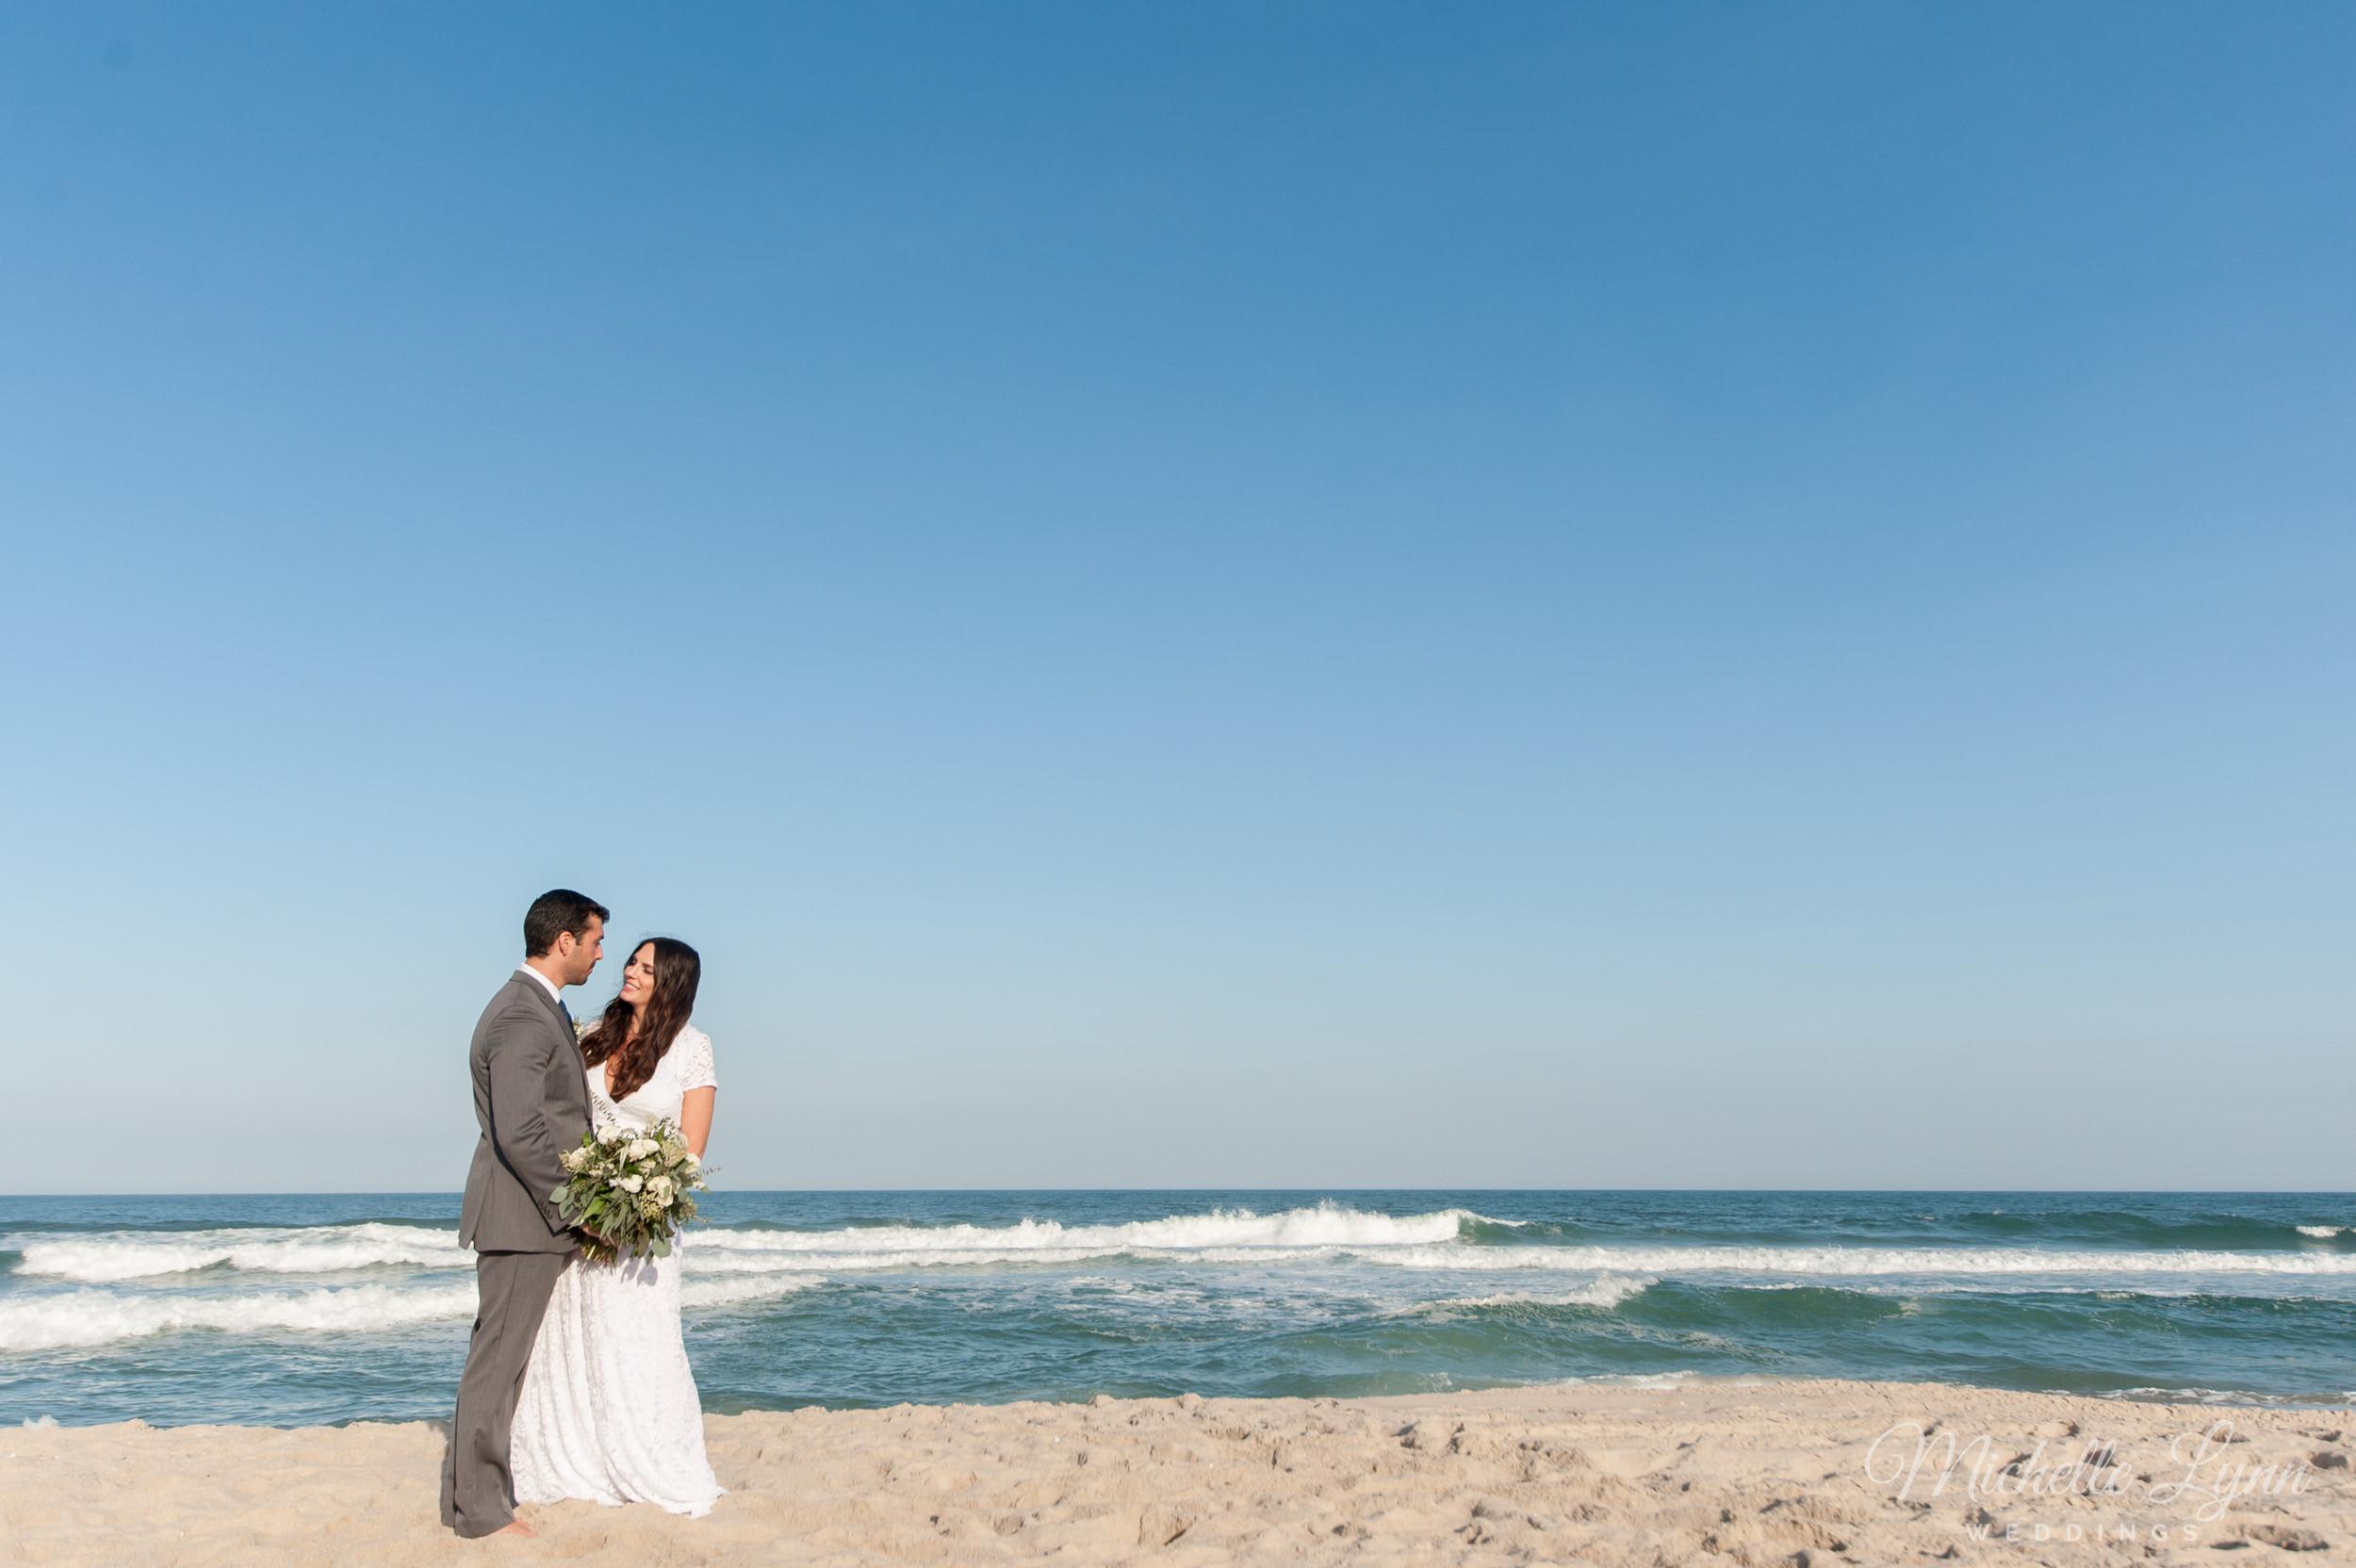 mlw-long-beach-island-new-jersey-wedding-photography-8.jpg